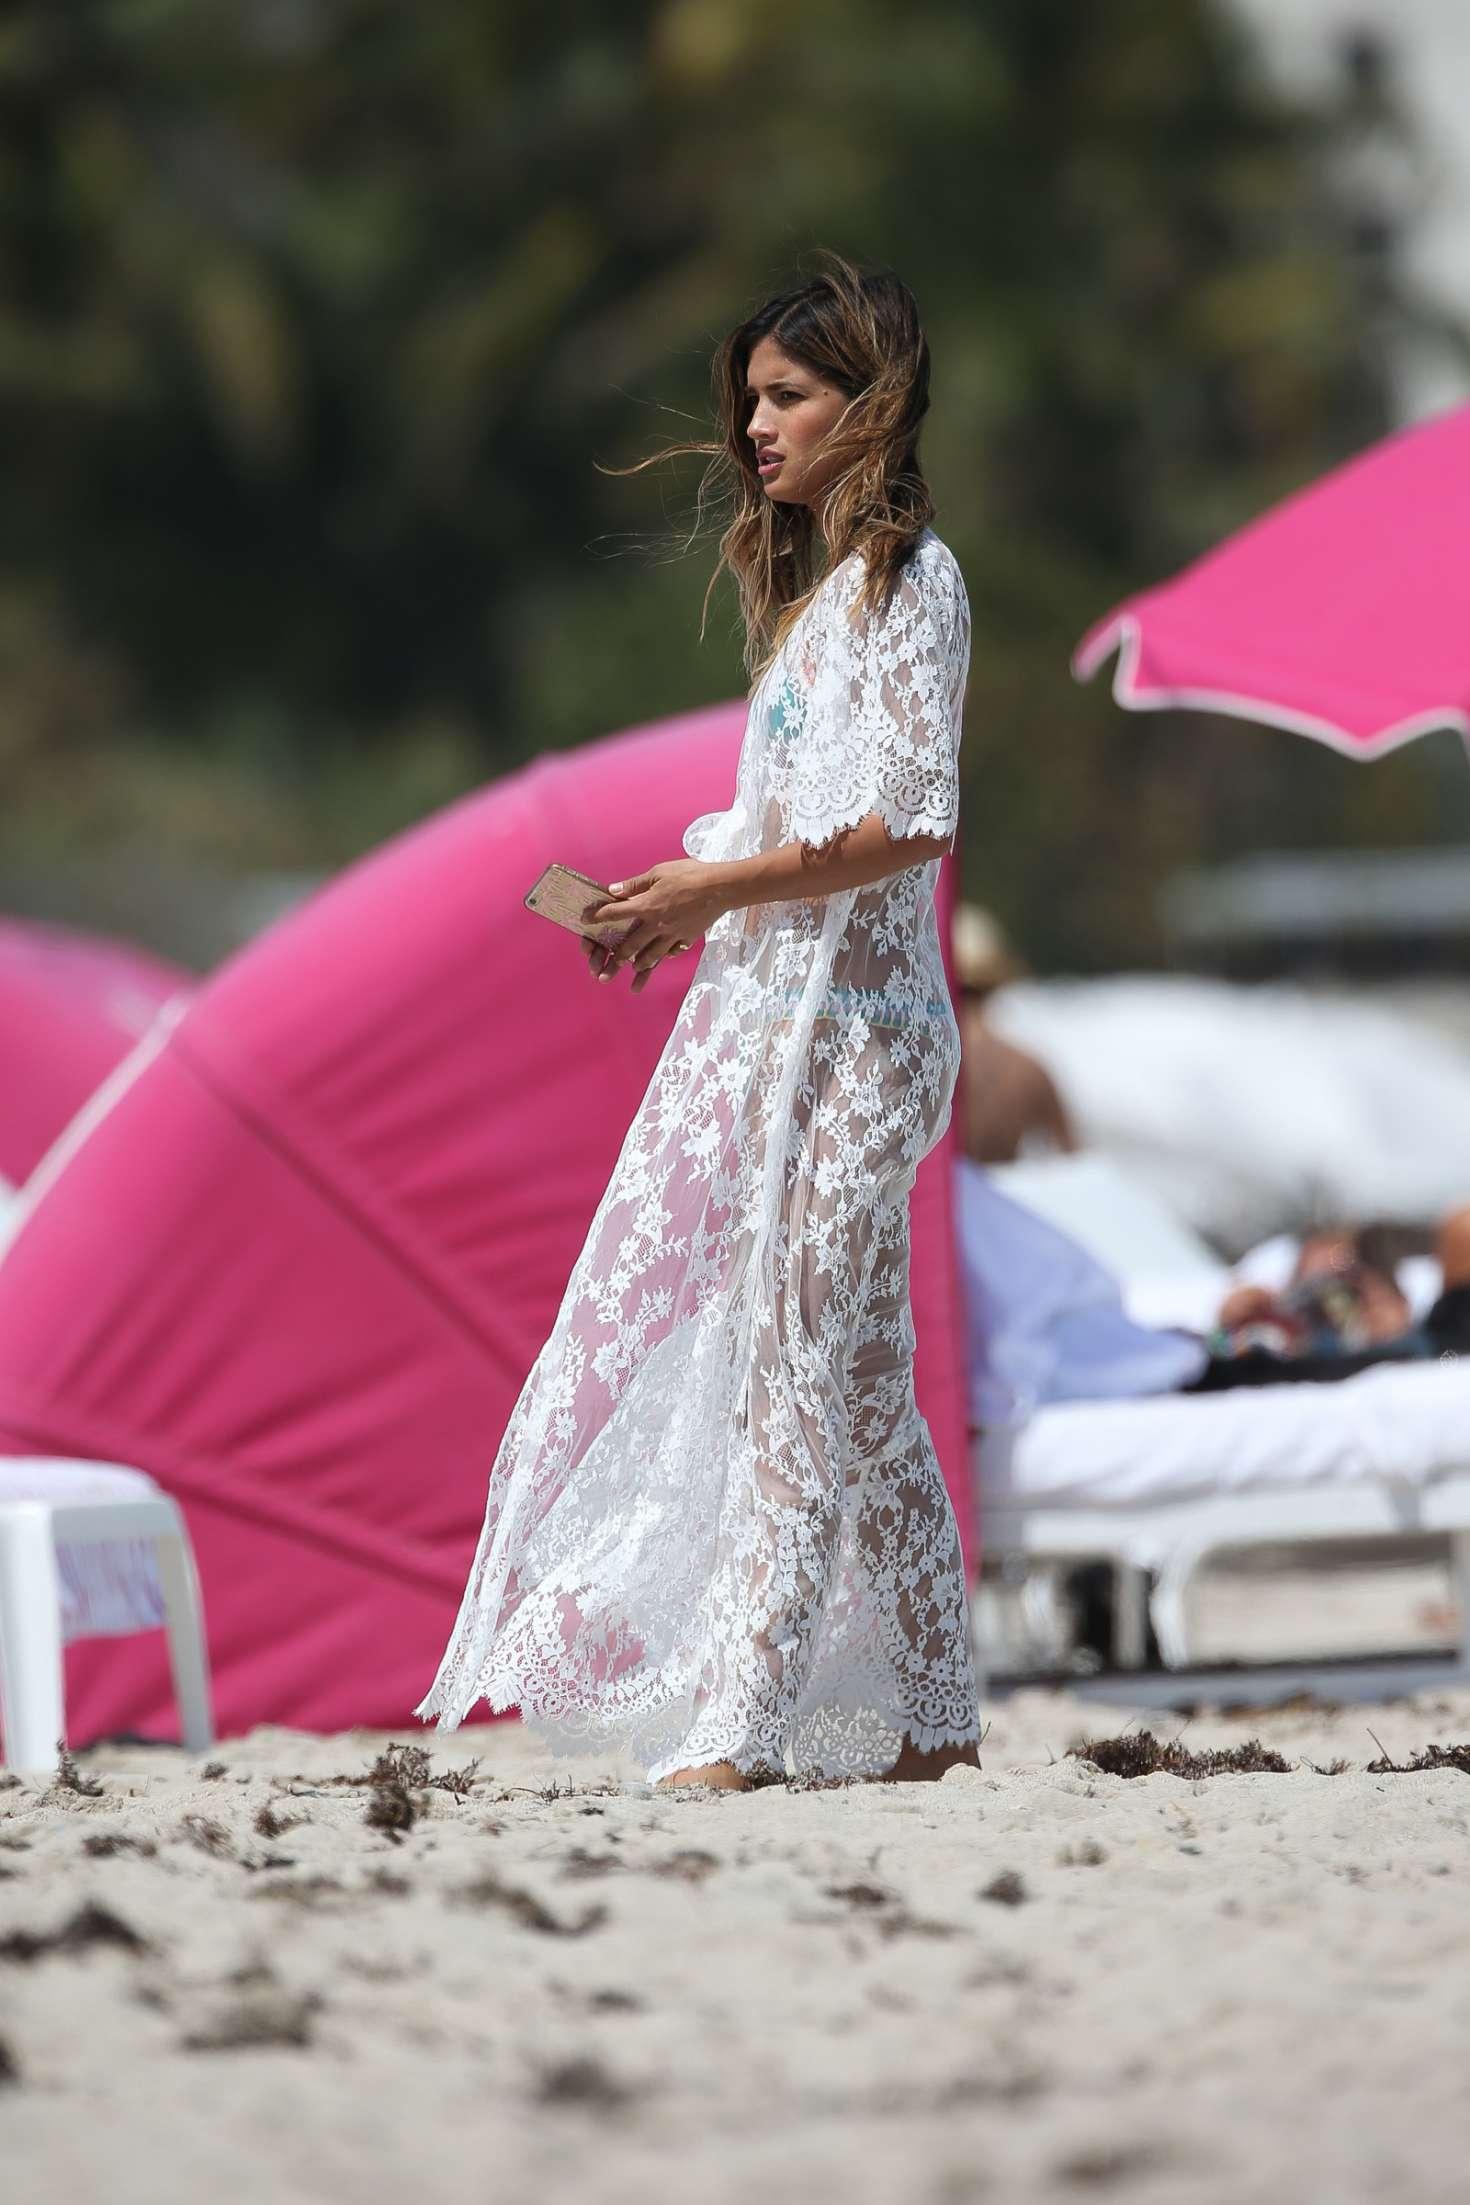 600acff1ec Rocky Barnes in White Dress on the beach in Miami Rocky-Barnes-in-